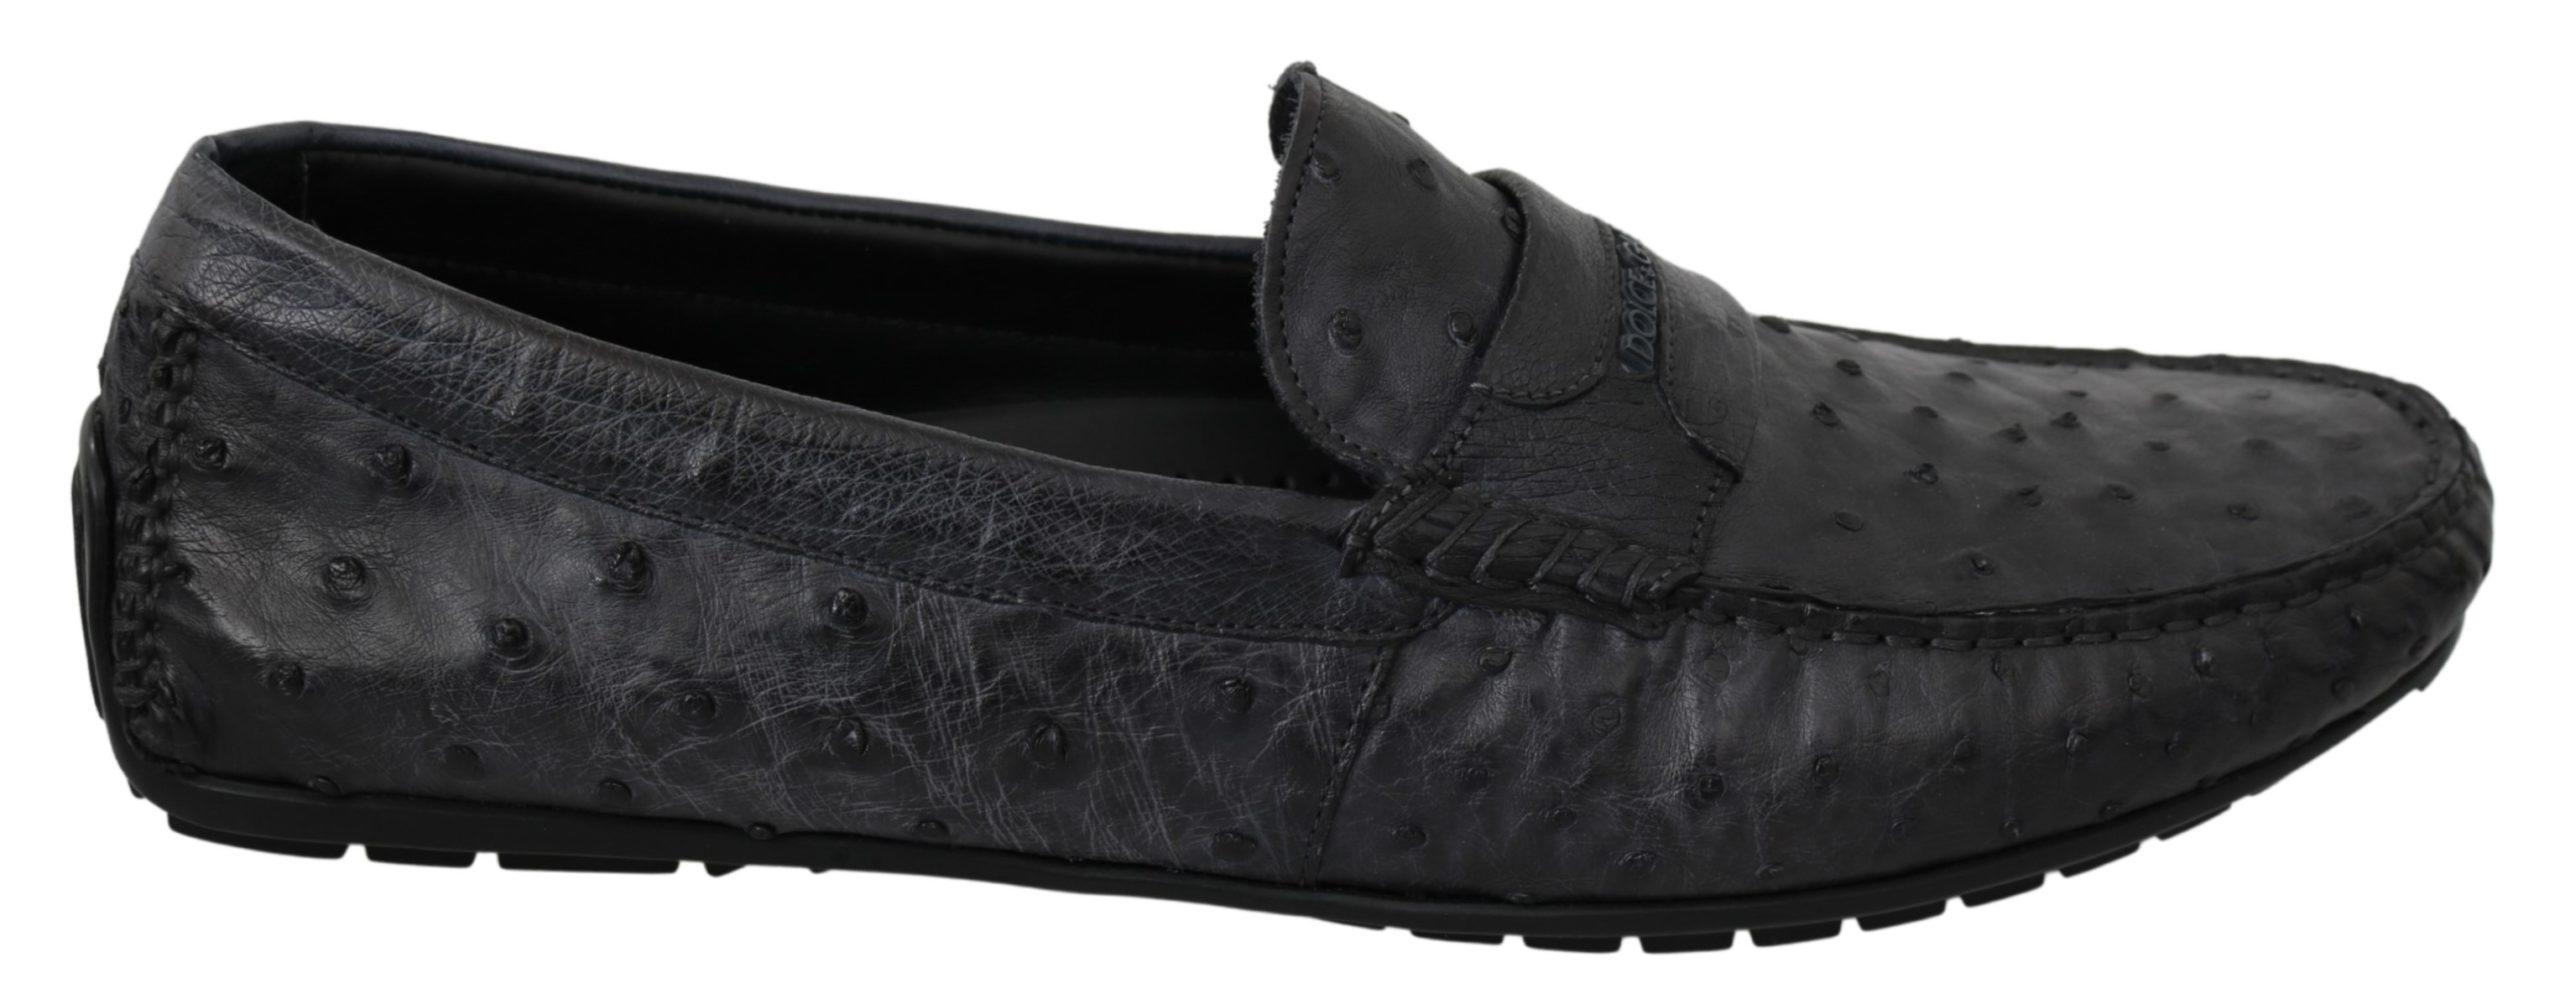 Dolce & Gabbana Men's Leather Exotic Skin Loafer Gray MV2852 - EU43/US10